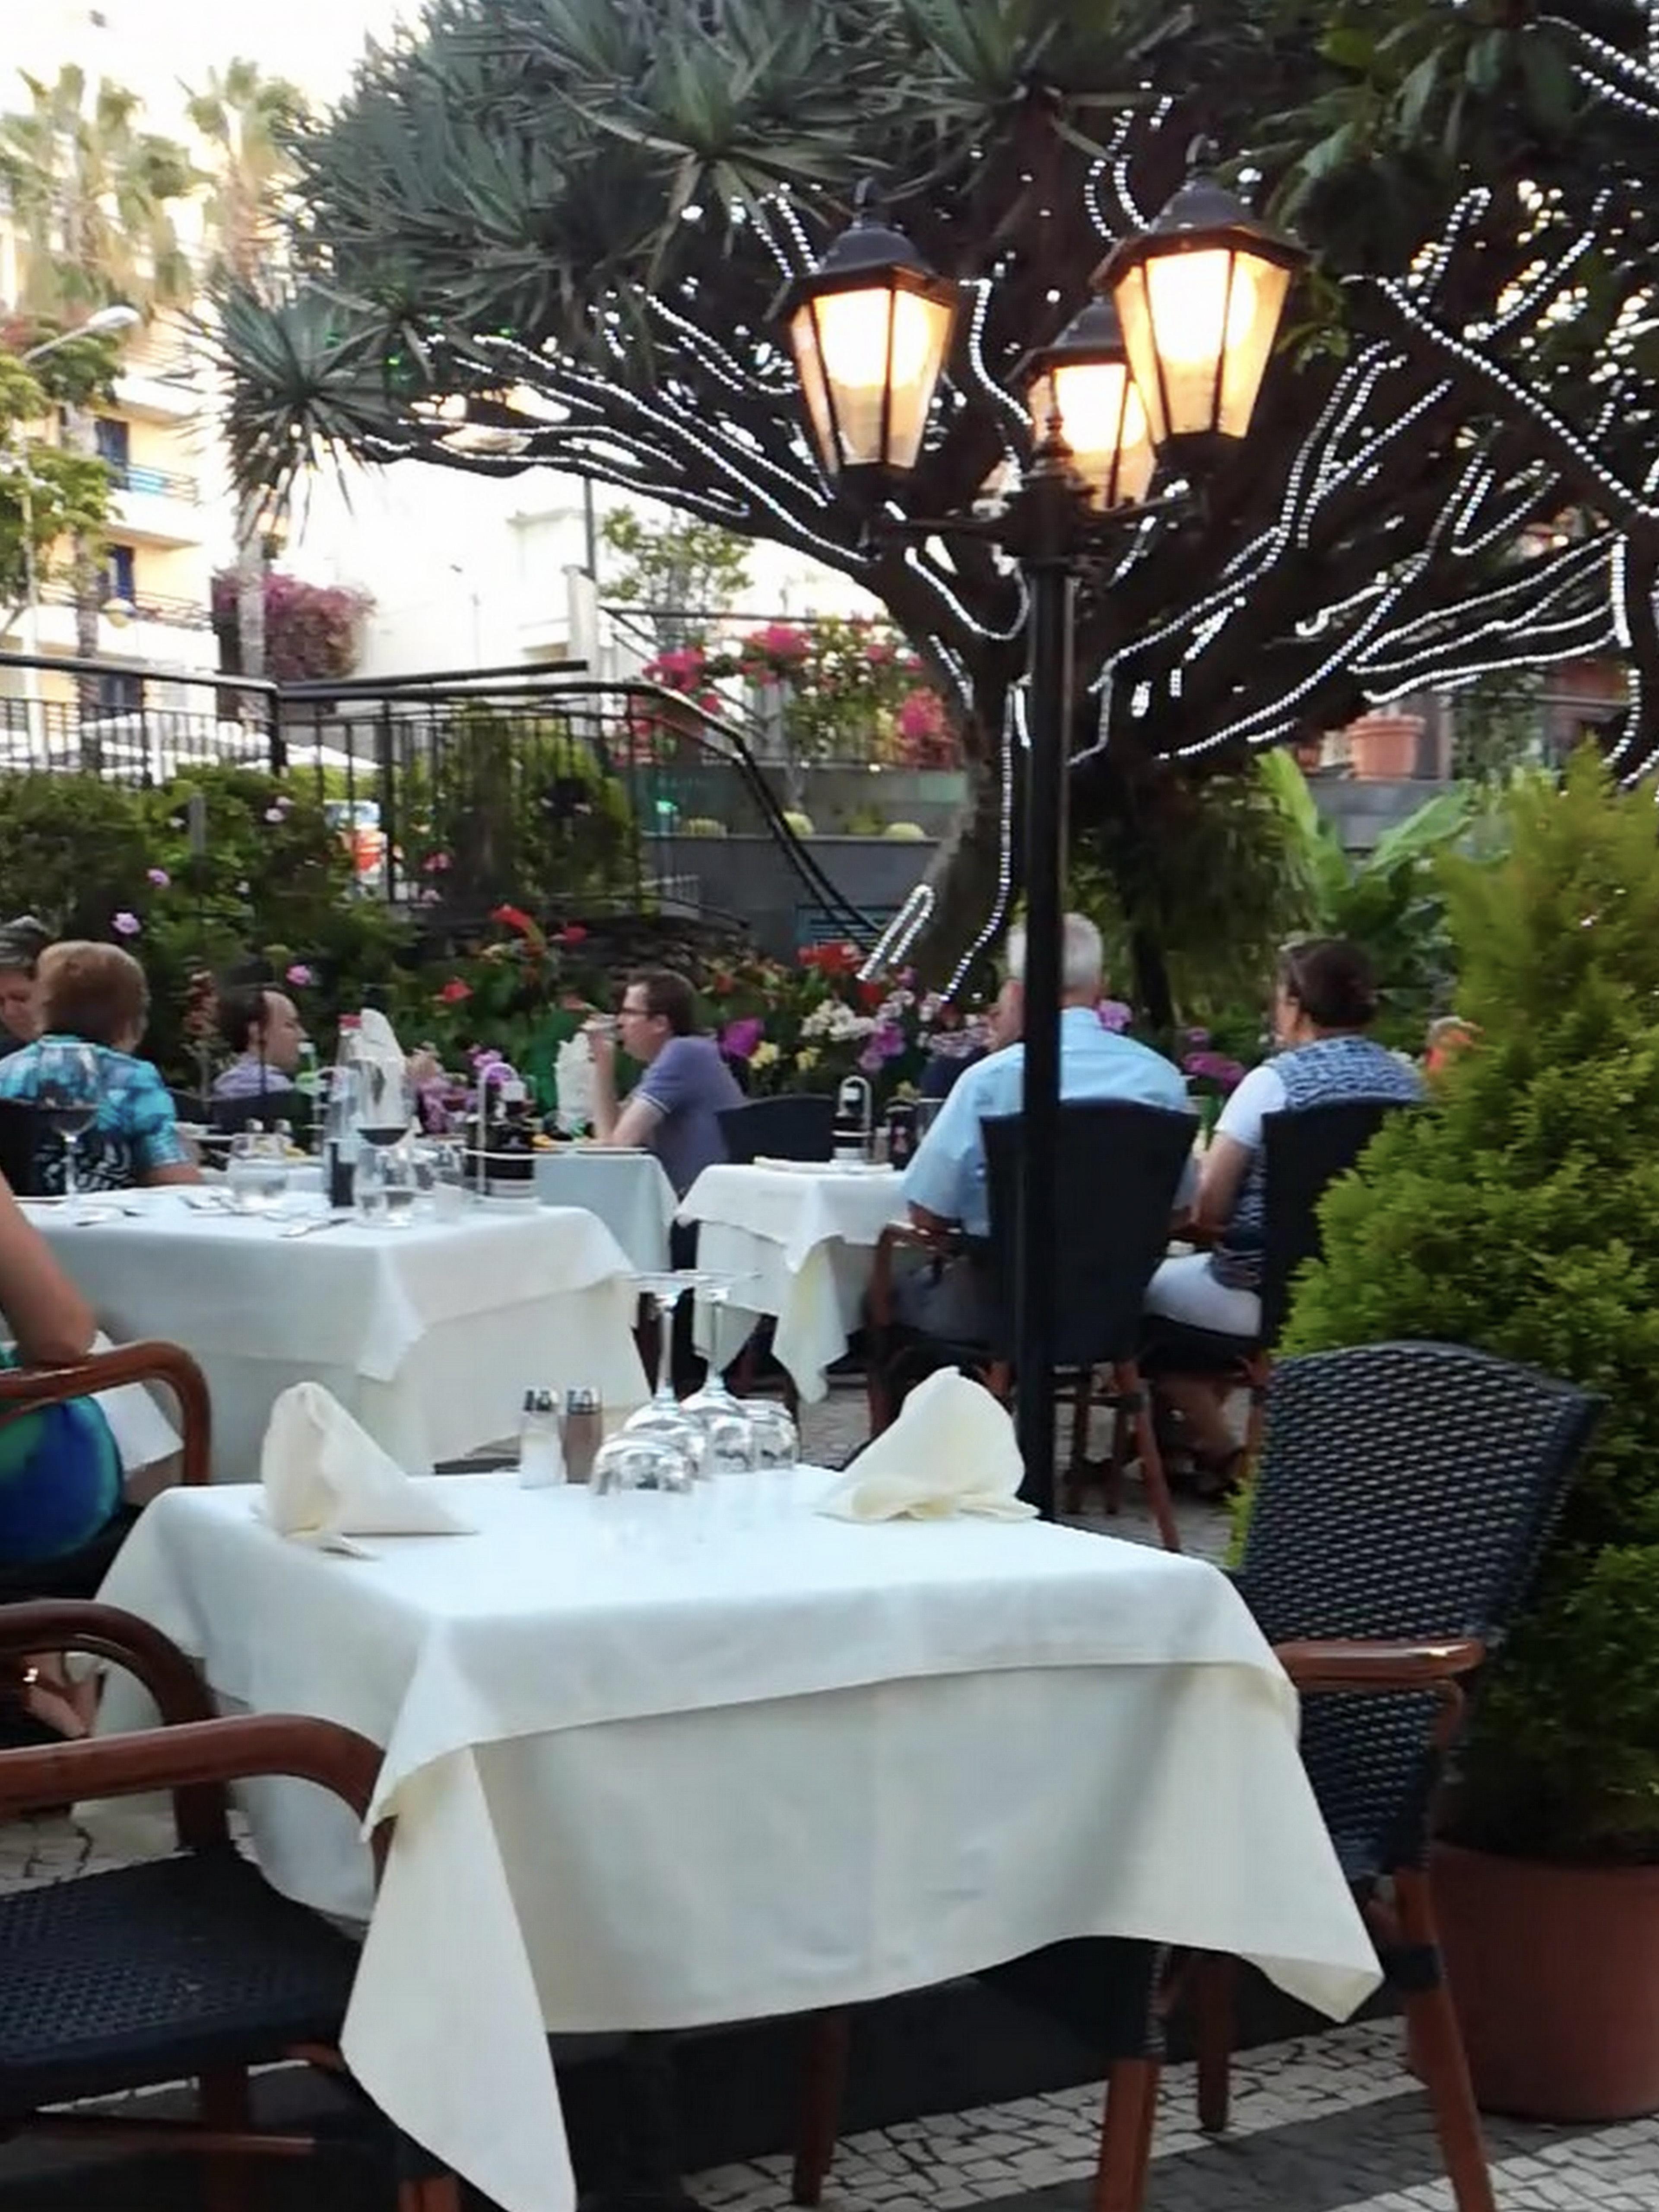 Madeira_restaurant_annukka_vuorela